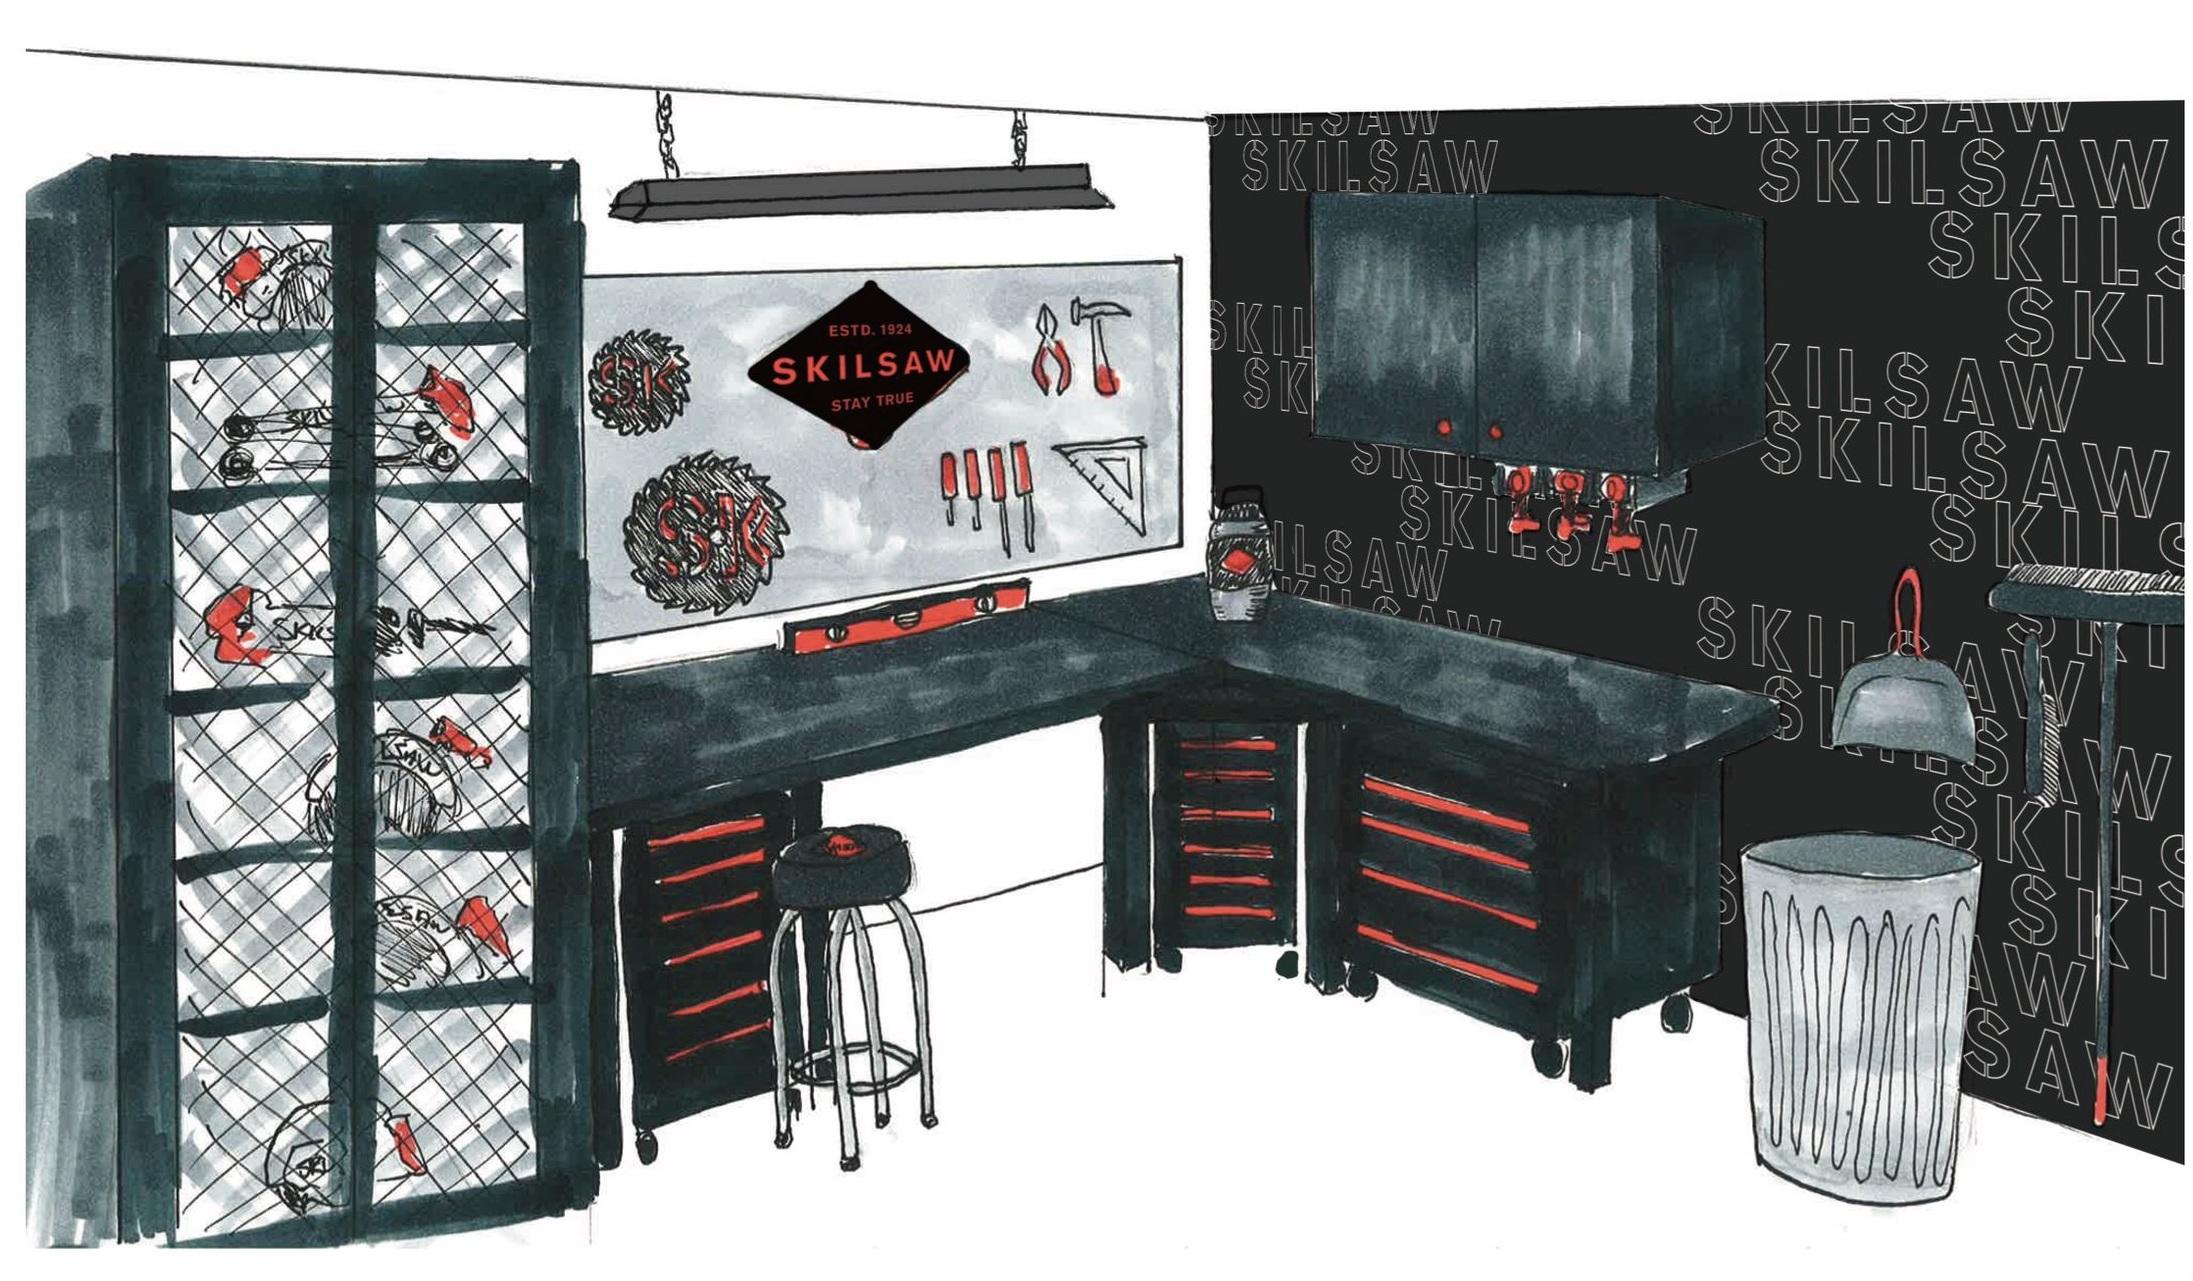 SKILSAW Pro Garage